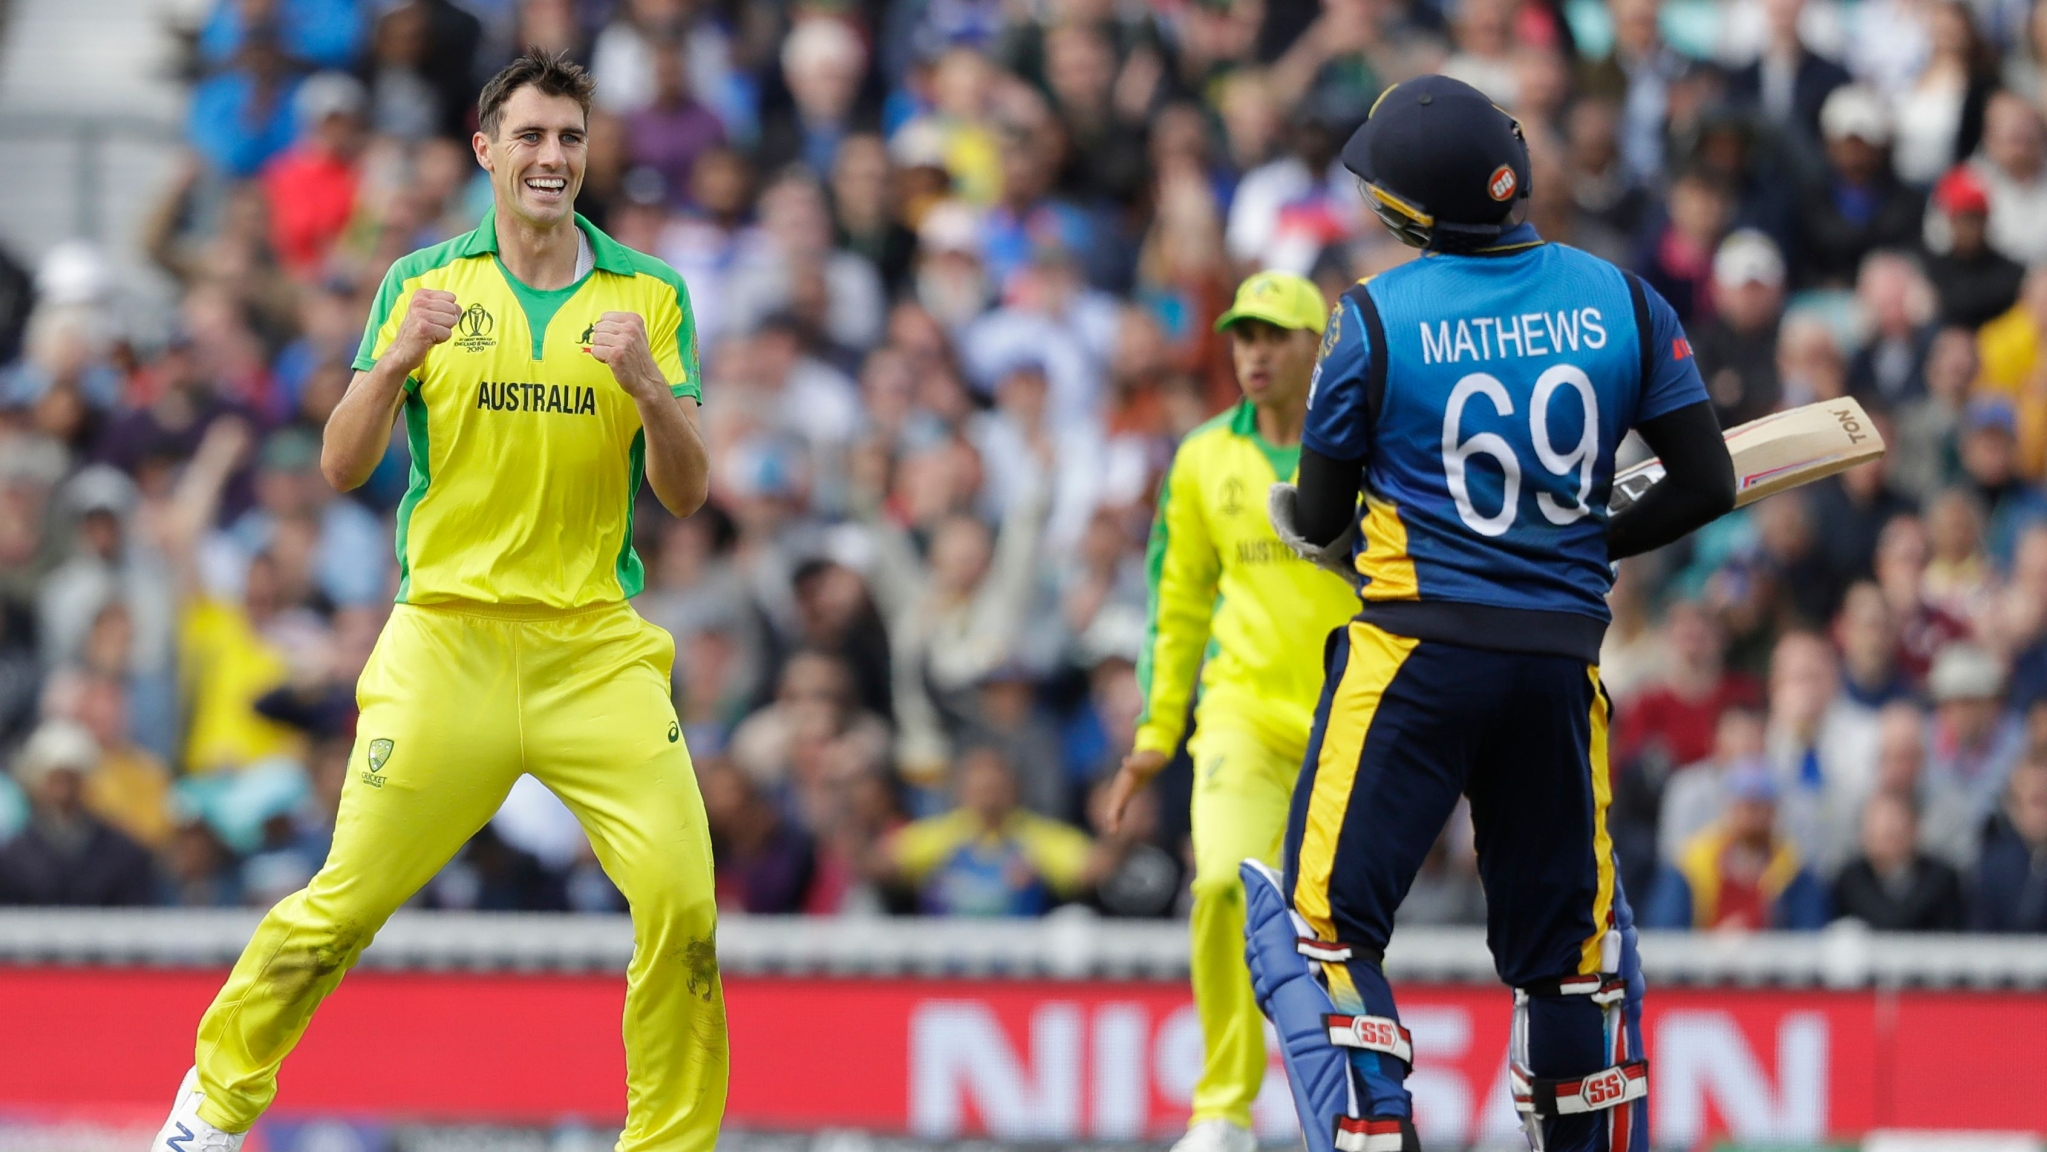 Twitter Reacts to Sri Lanka's Batting Collapse Against Australia